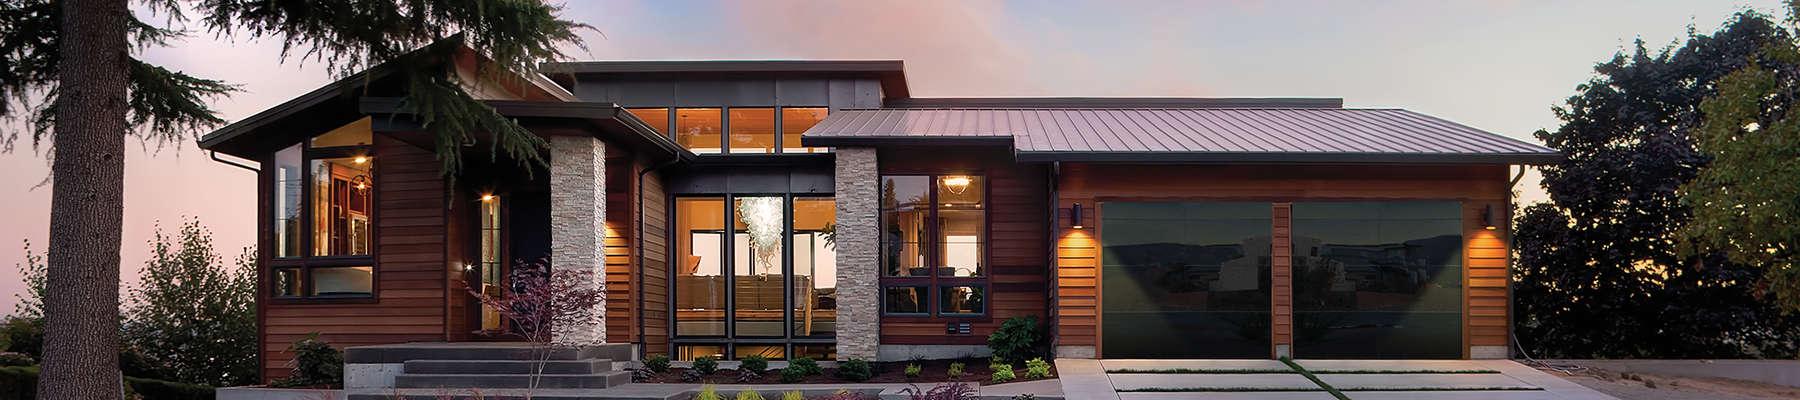 beautiful home featuring double garage doors